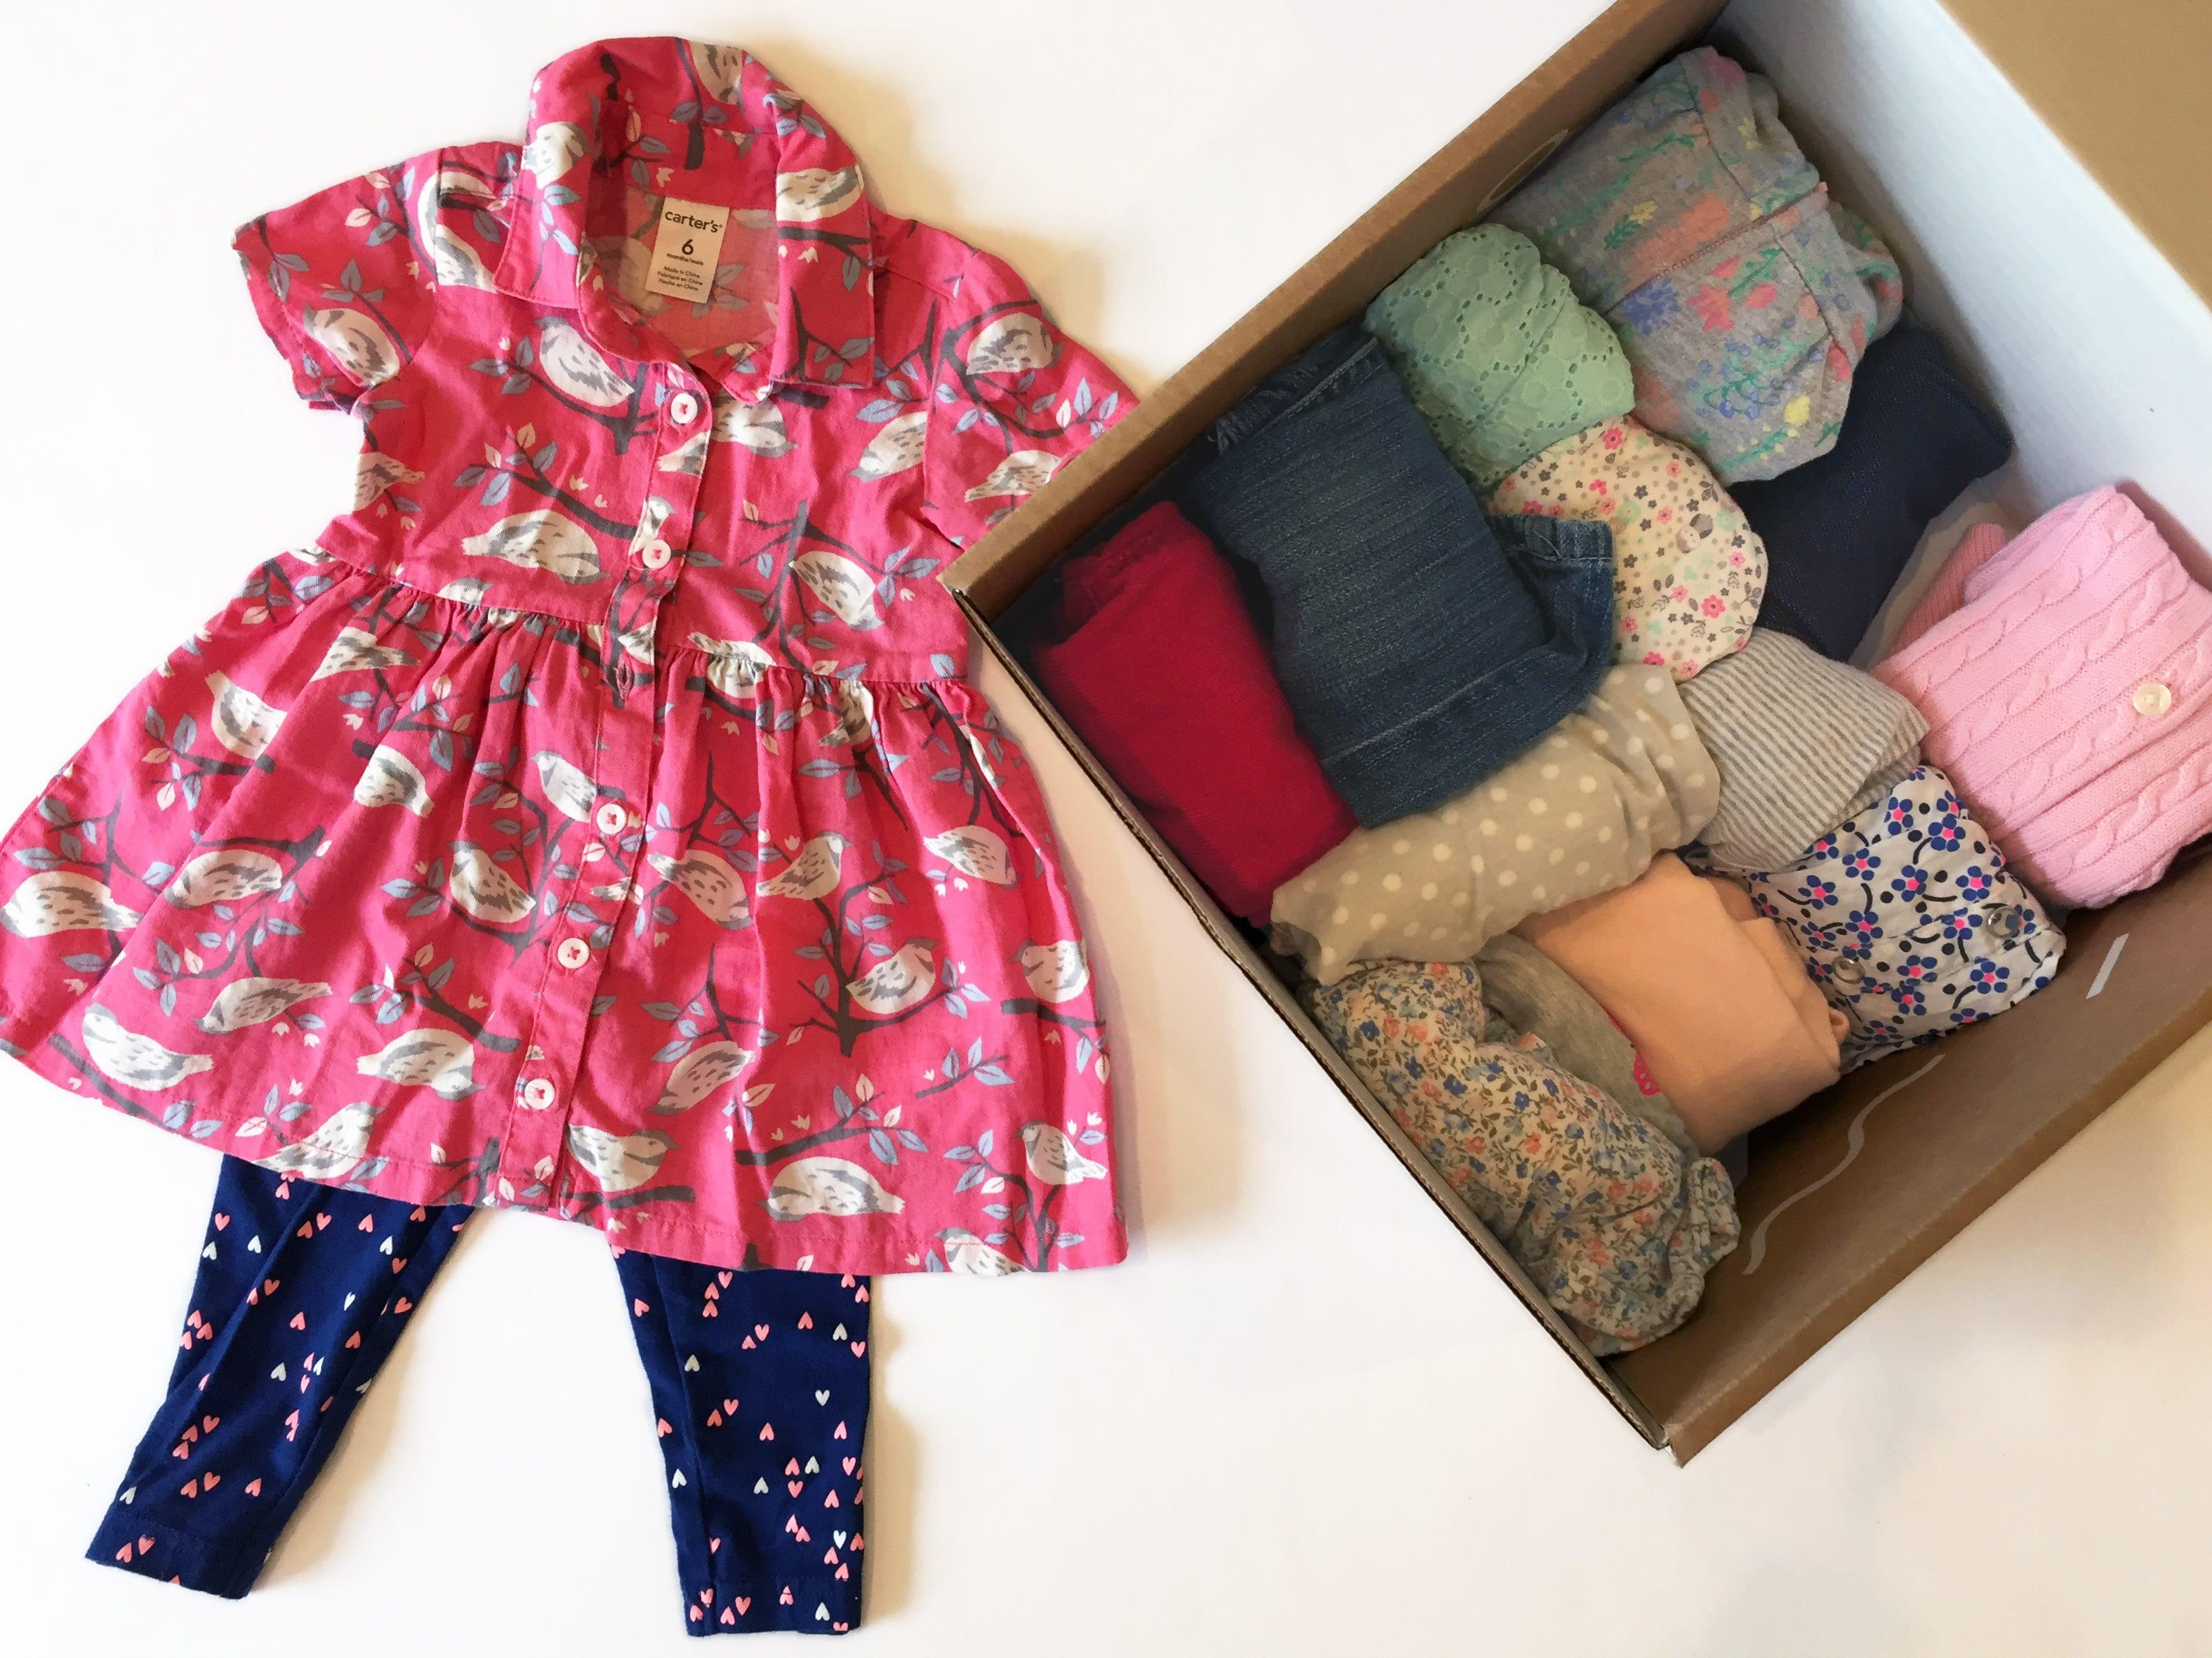 45169f6f74b15 eTailers As Children's Clothing Treasure Hunters | PYMNTS.com